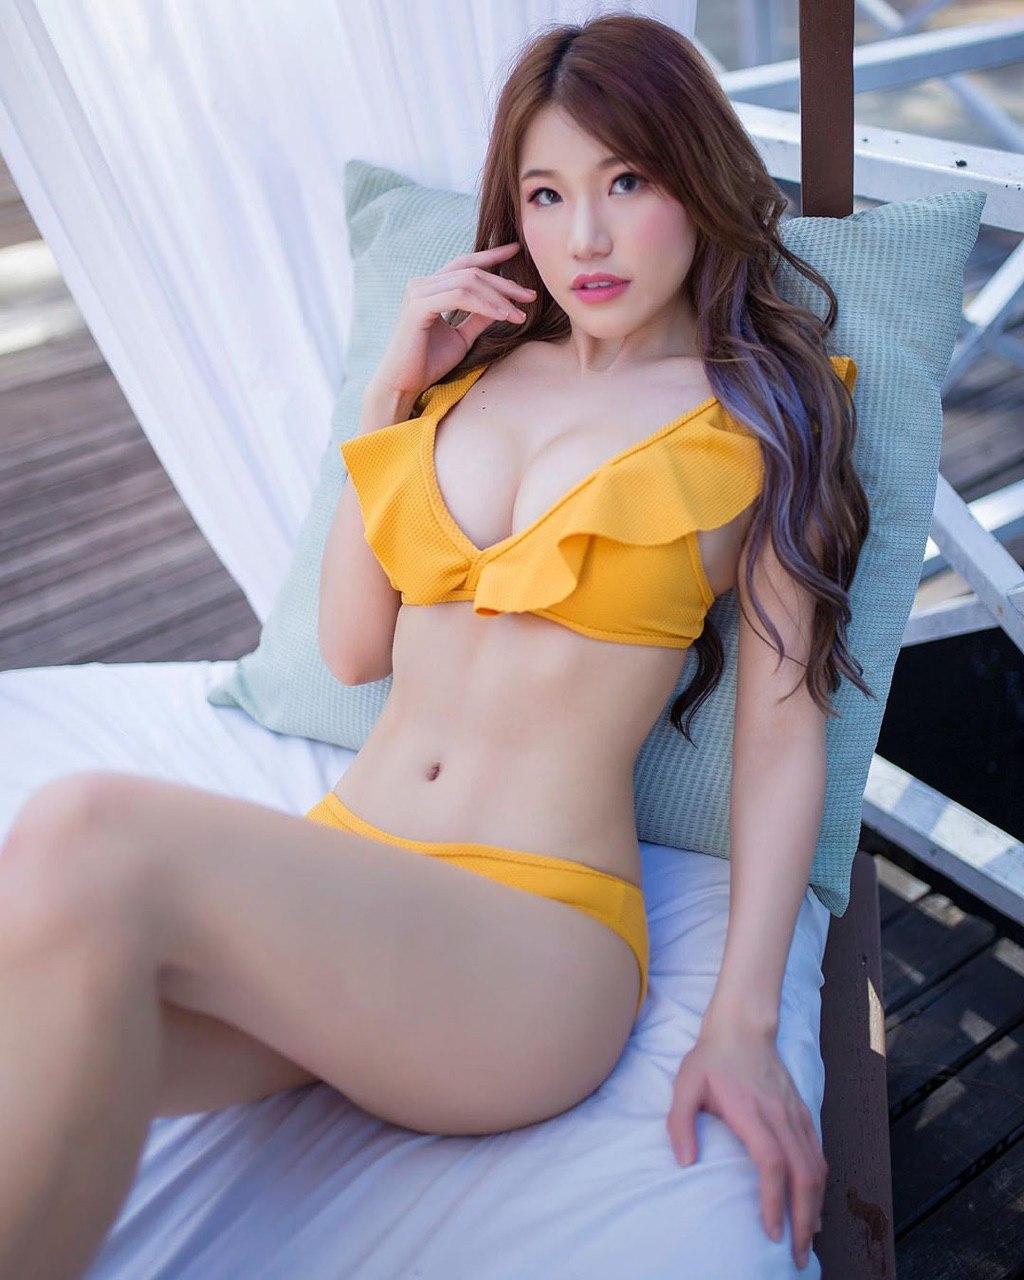 photo_2894@12-01-2020_19-17-09.jpg